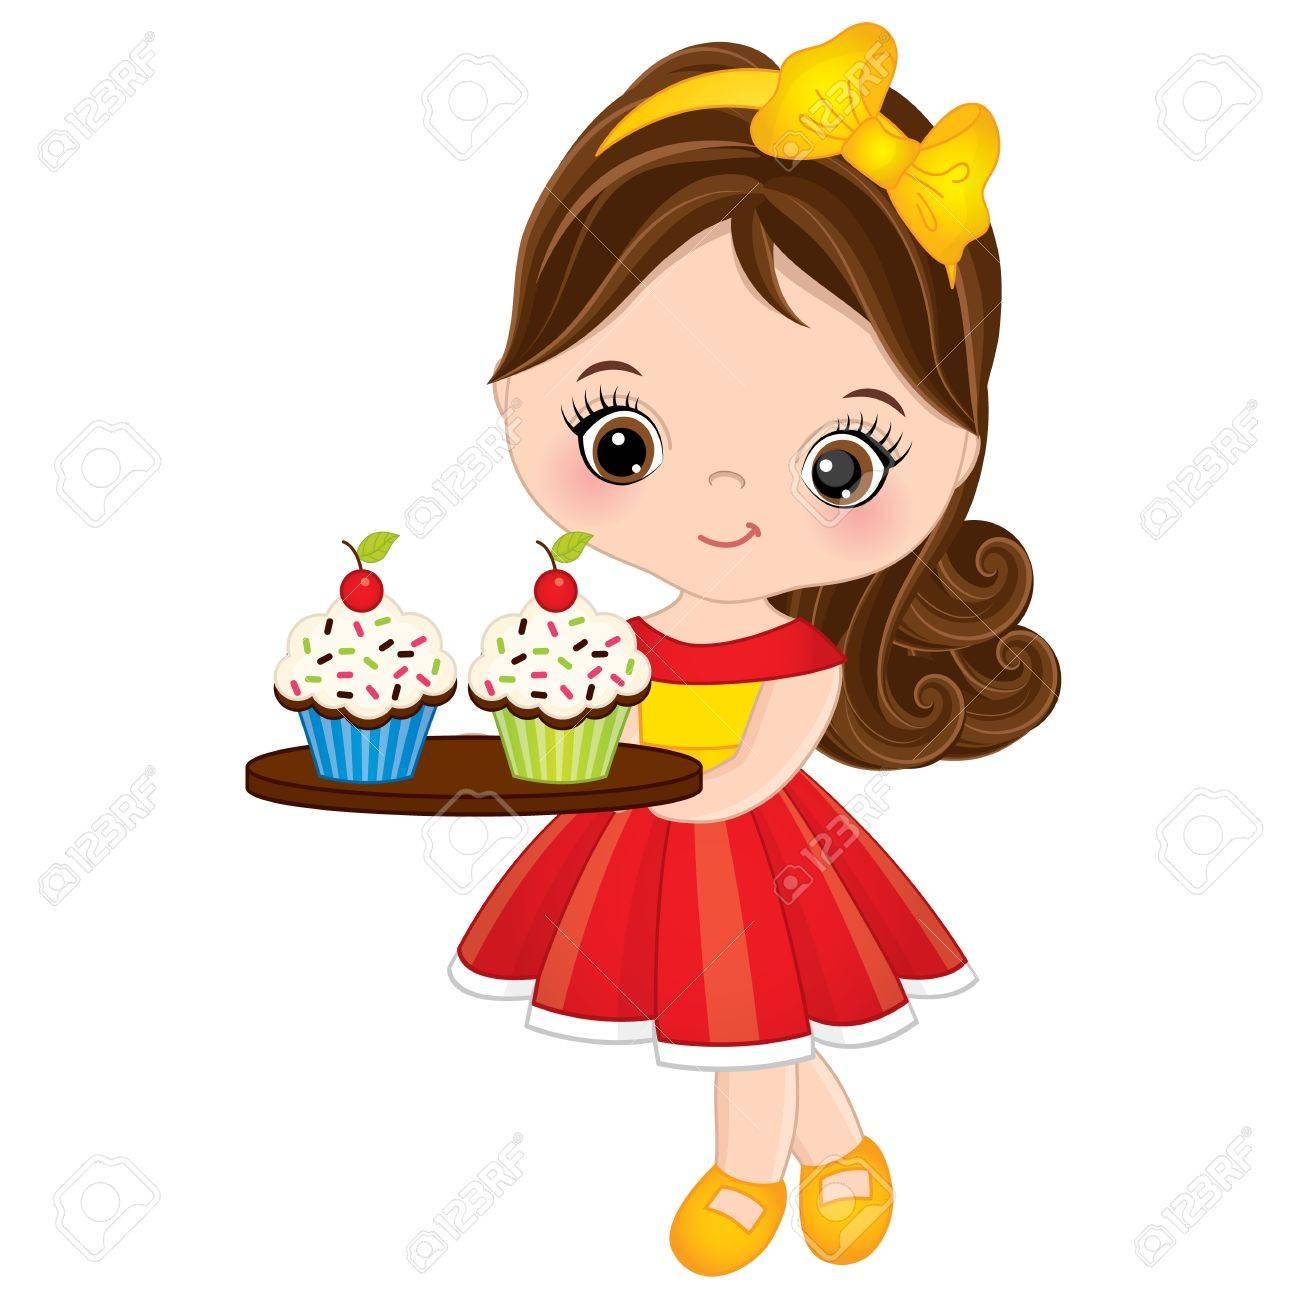 Girl Eating Cupcake Clipart.